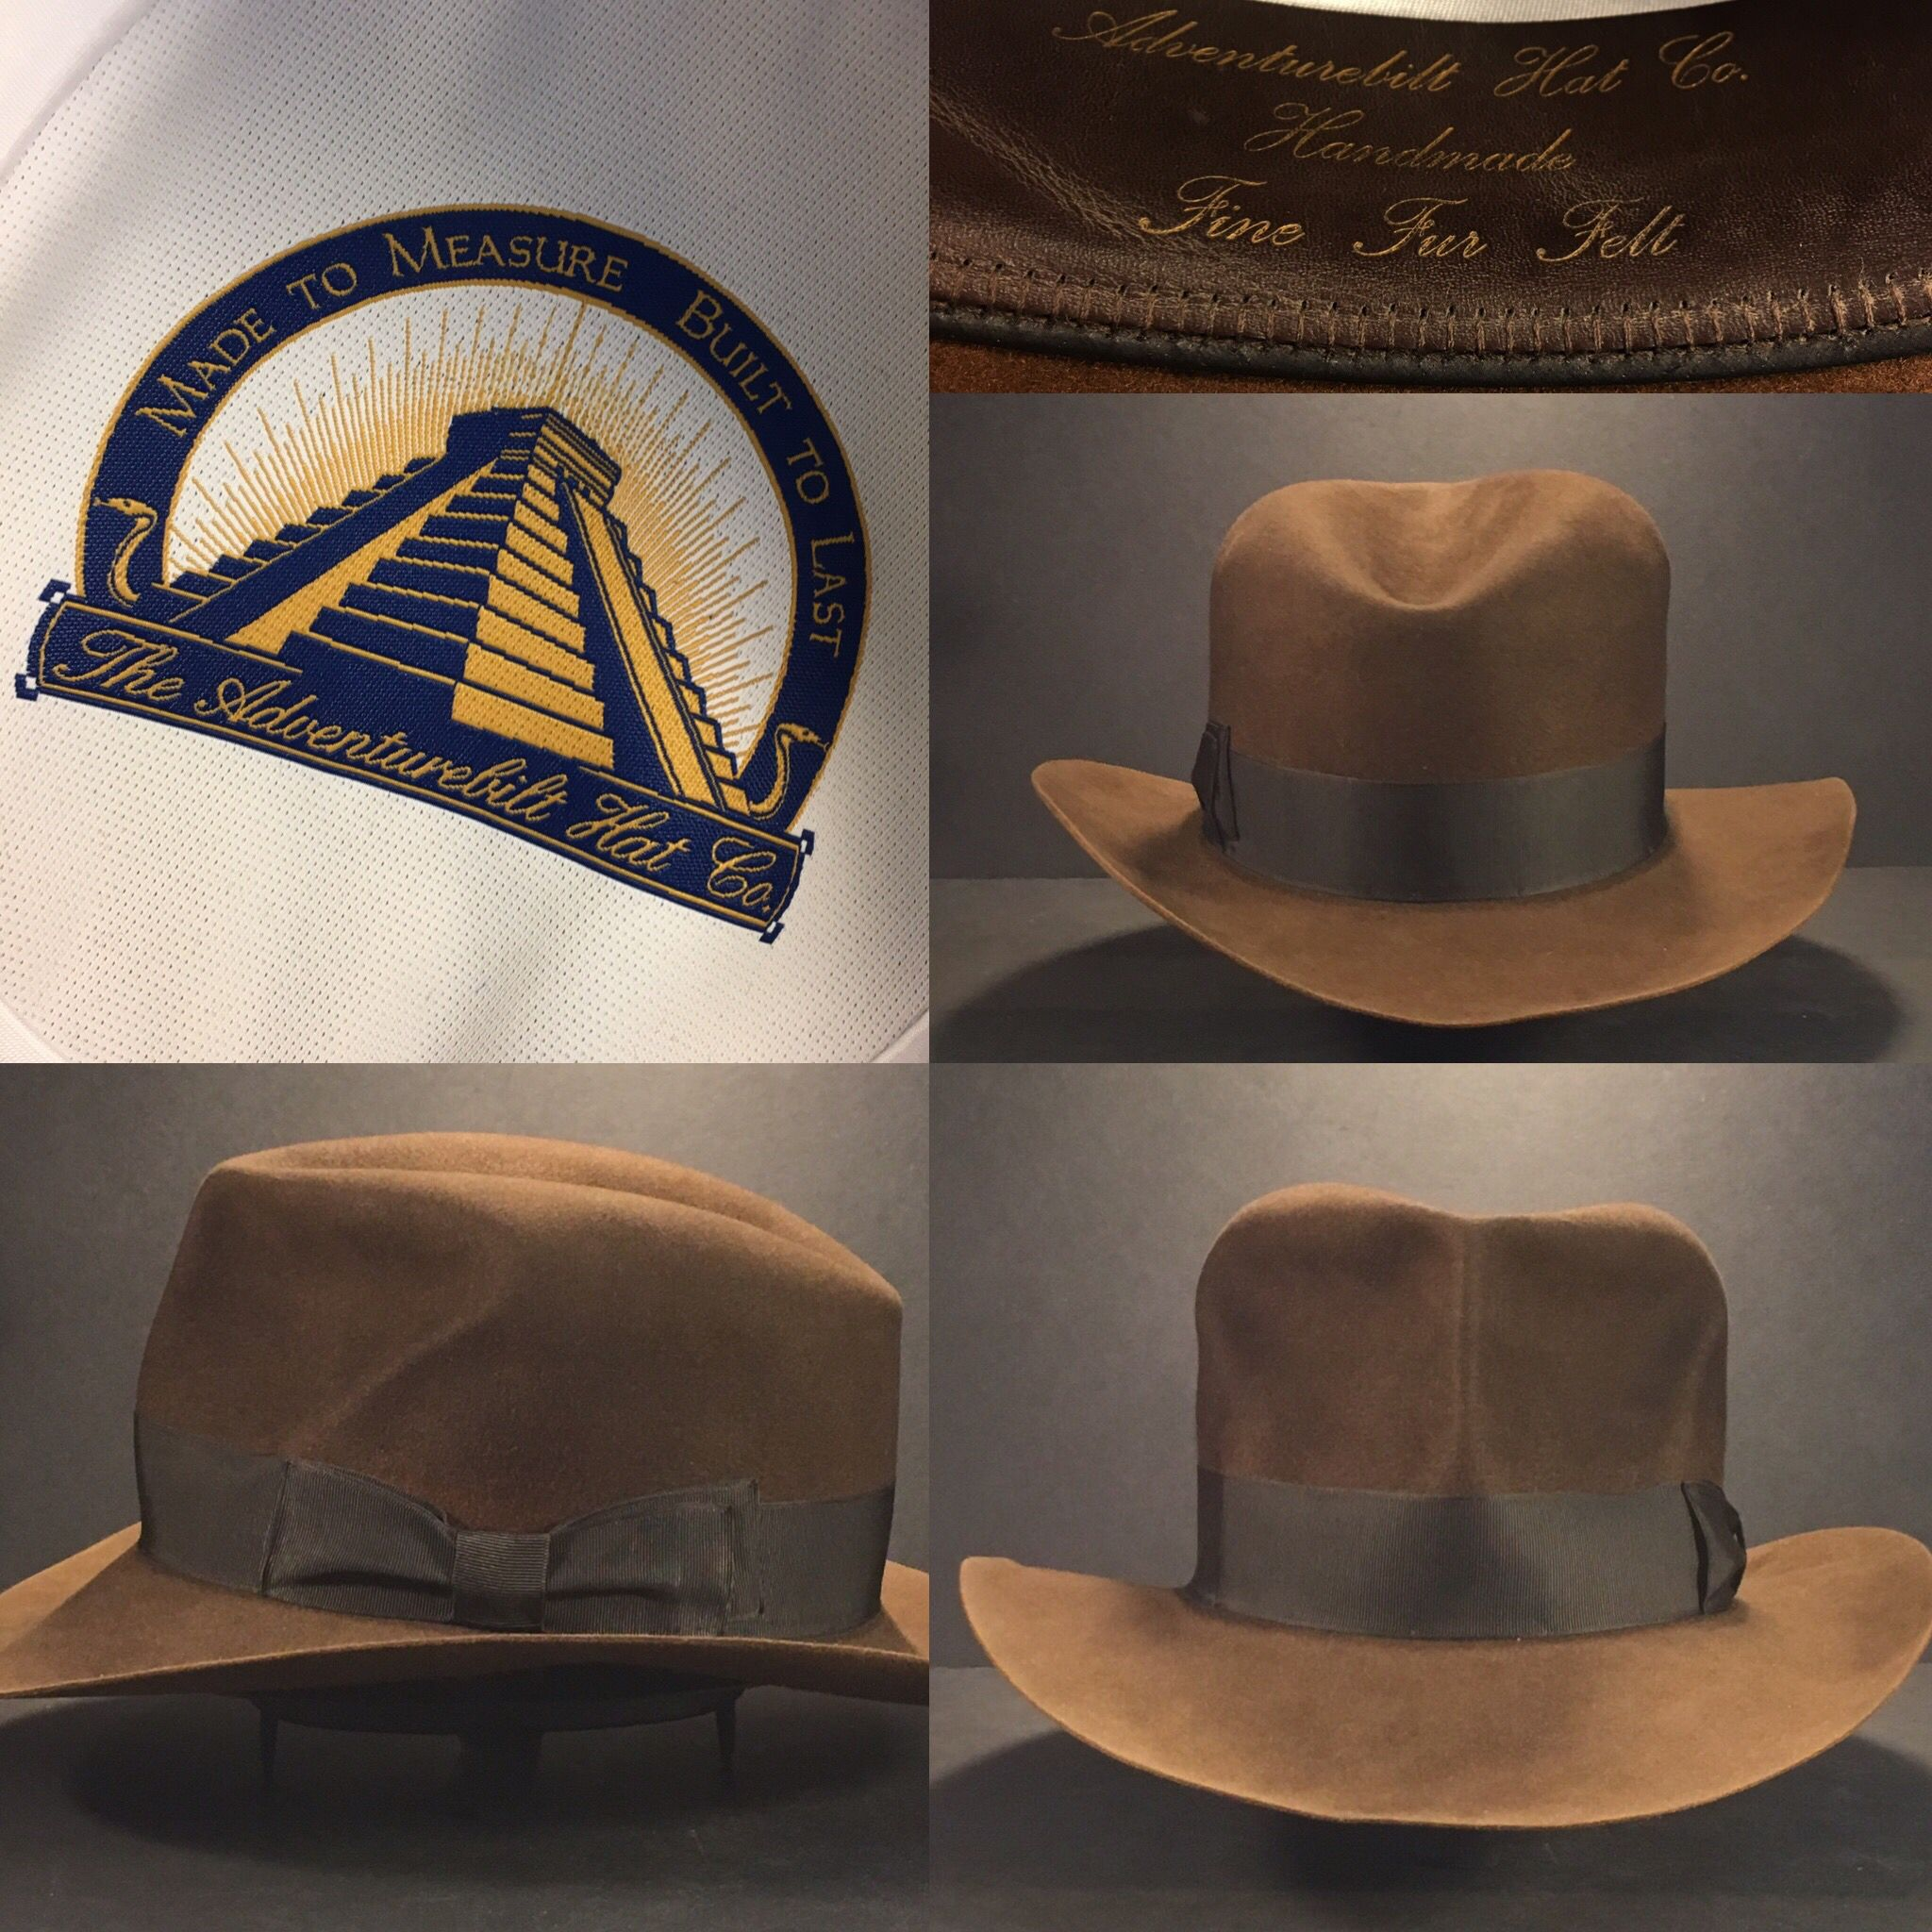 Adventurebilt Hats Hats For Men Hats Bespoke Hats